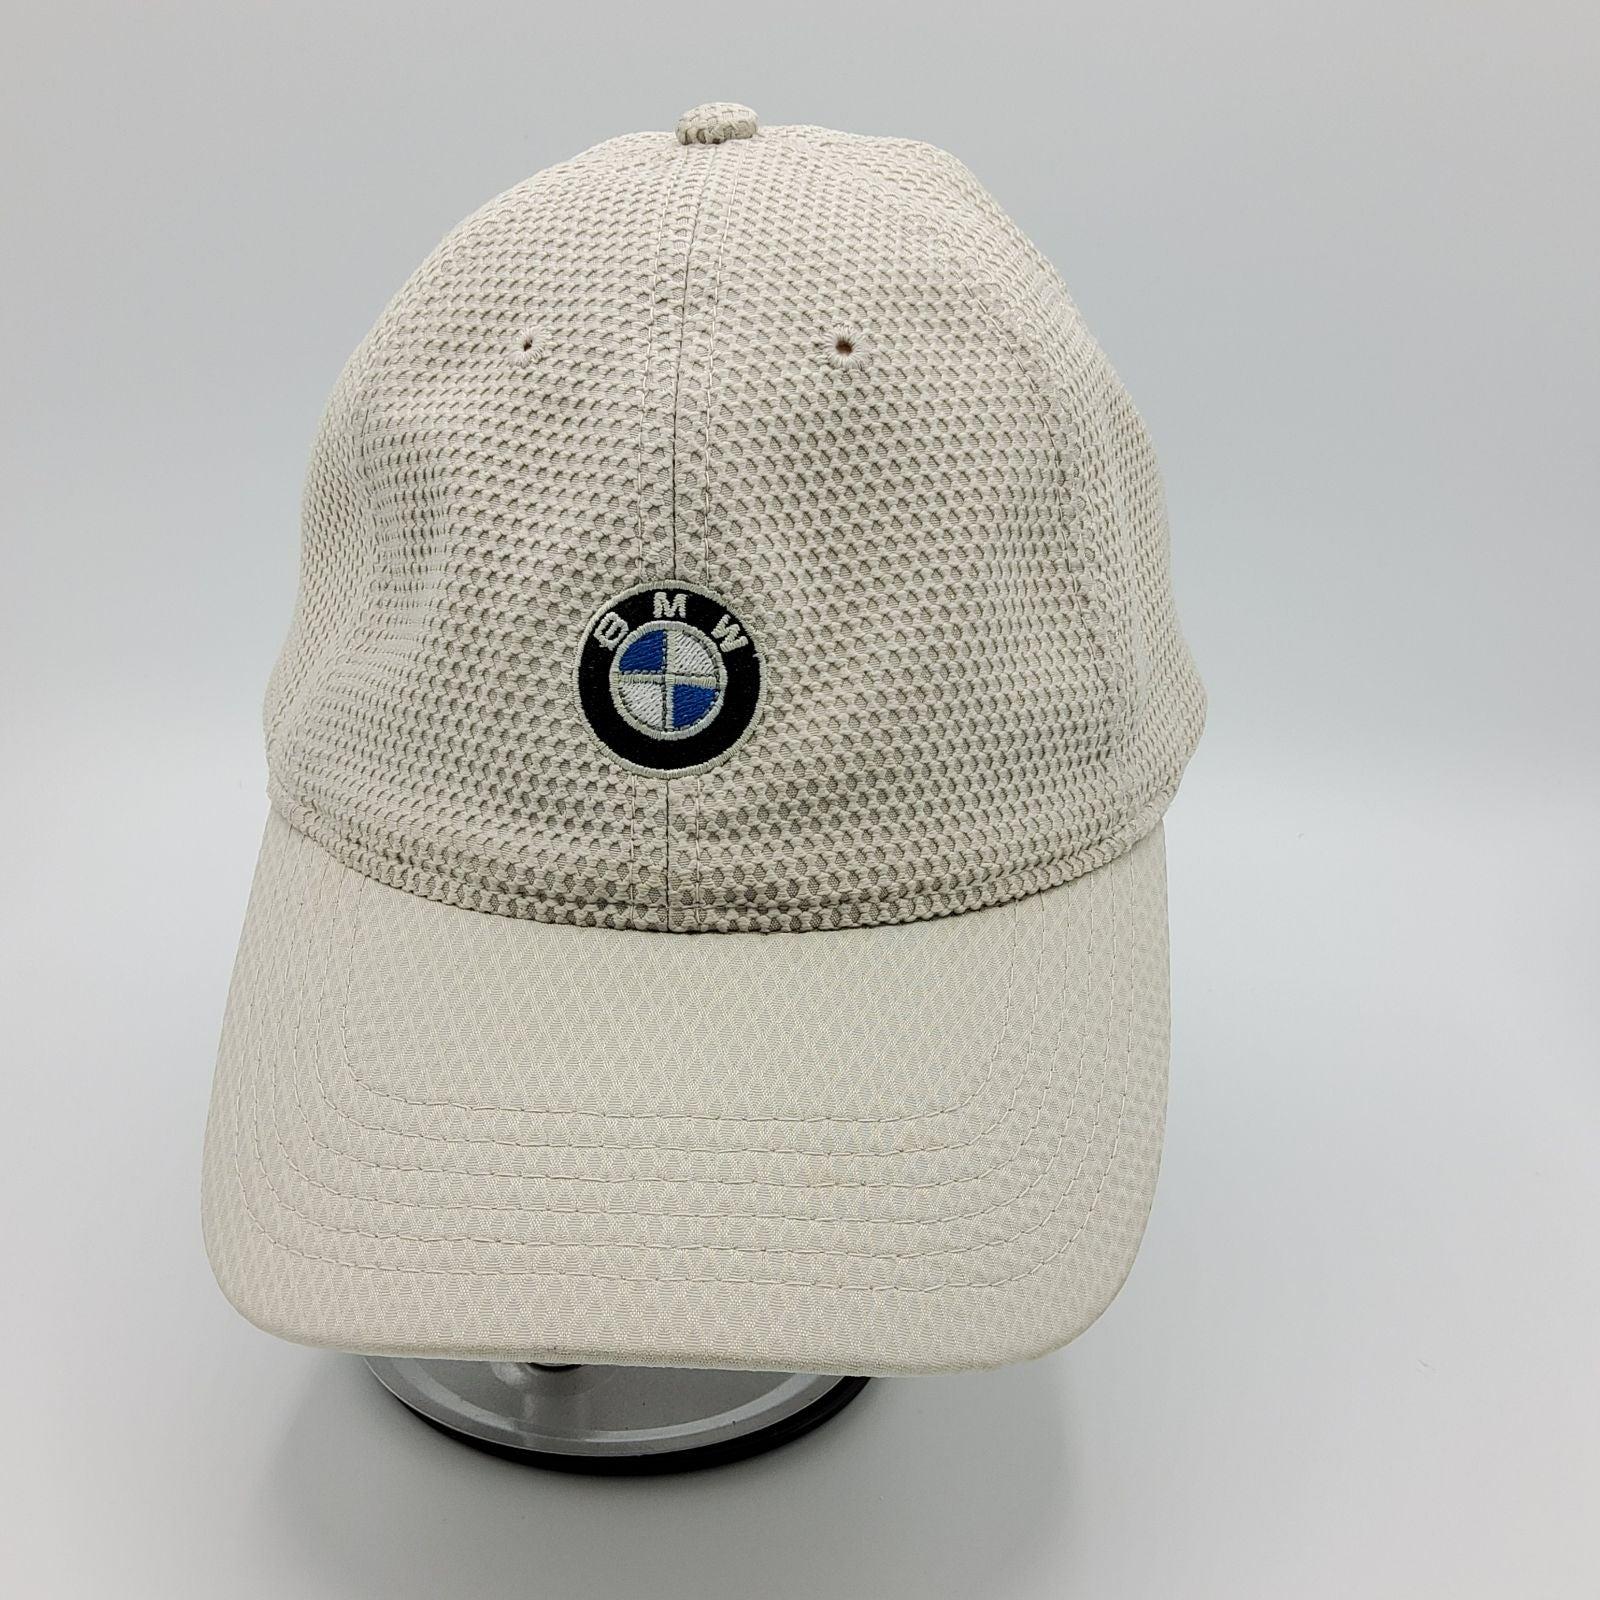 BMW Lifestyle Hat with Adjustable Velcro